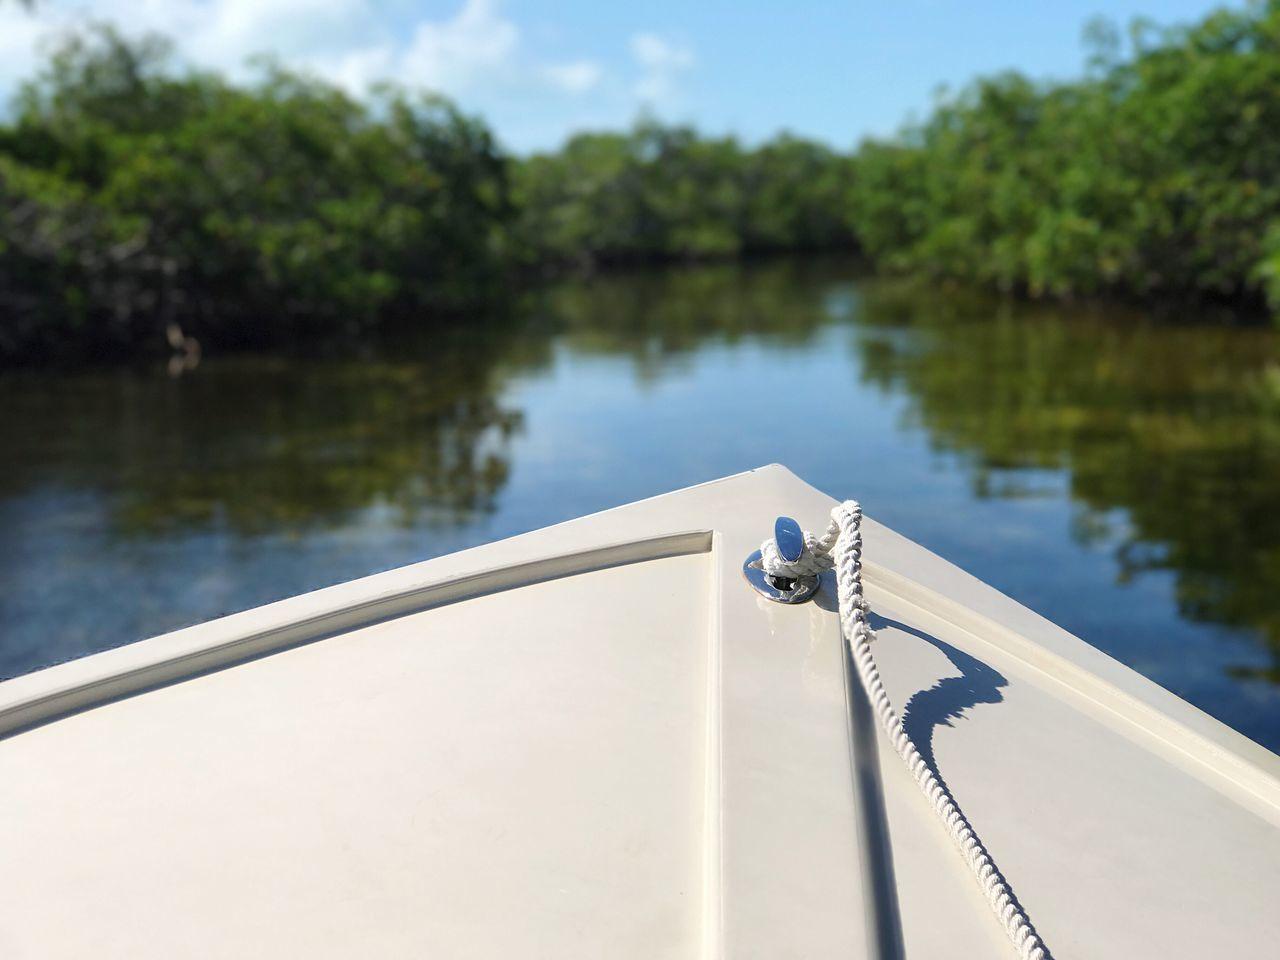 In the mangroves The Way Forward The Bahamas bBiminipPhotographyisthemuseoOutdoorsEEnjoying NaturemMangrovesOOn The WaterTTravel PhotographytTravel DestinationsnNautical VesselwWatermMode Of TransportdDaybBoat